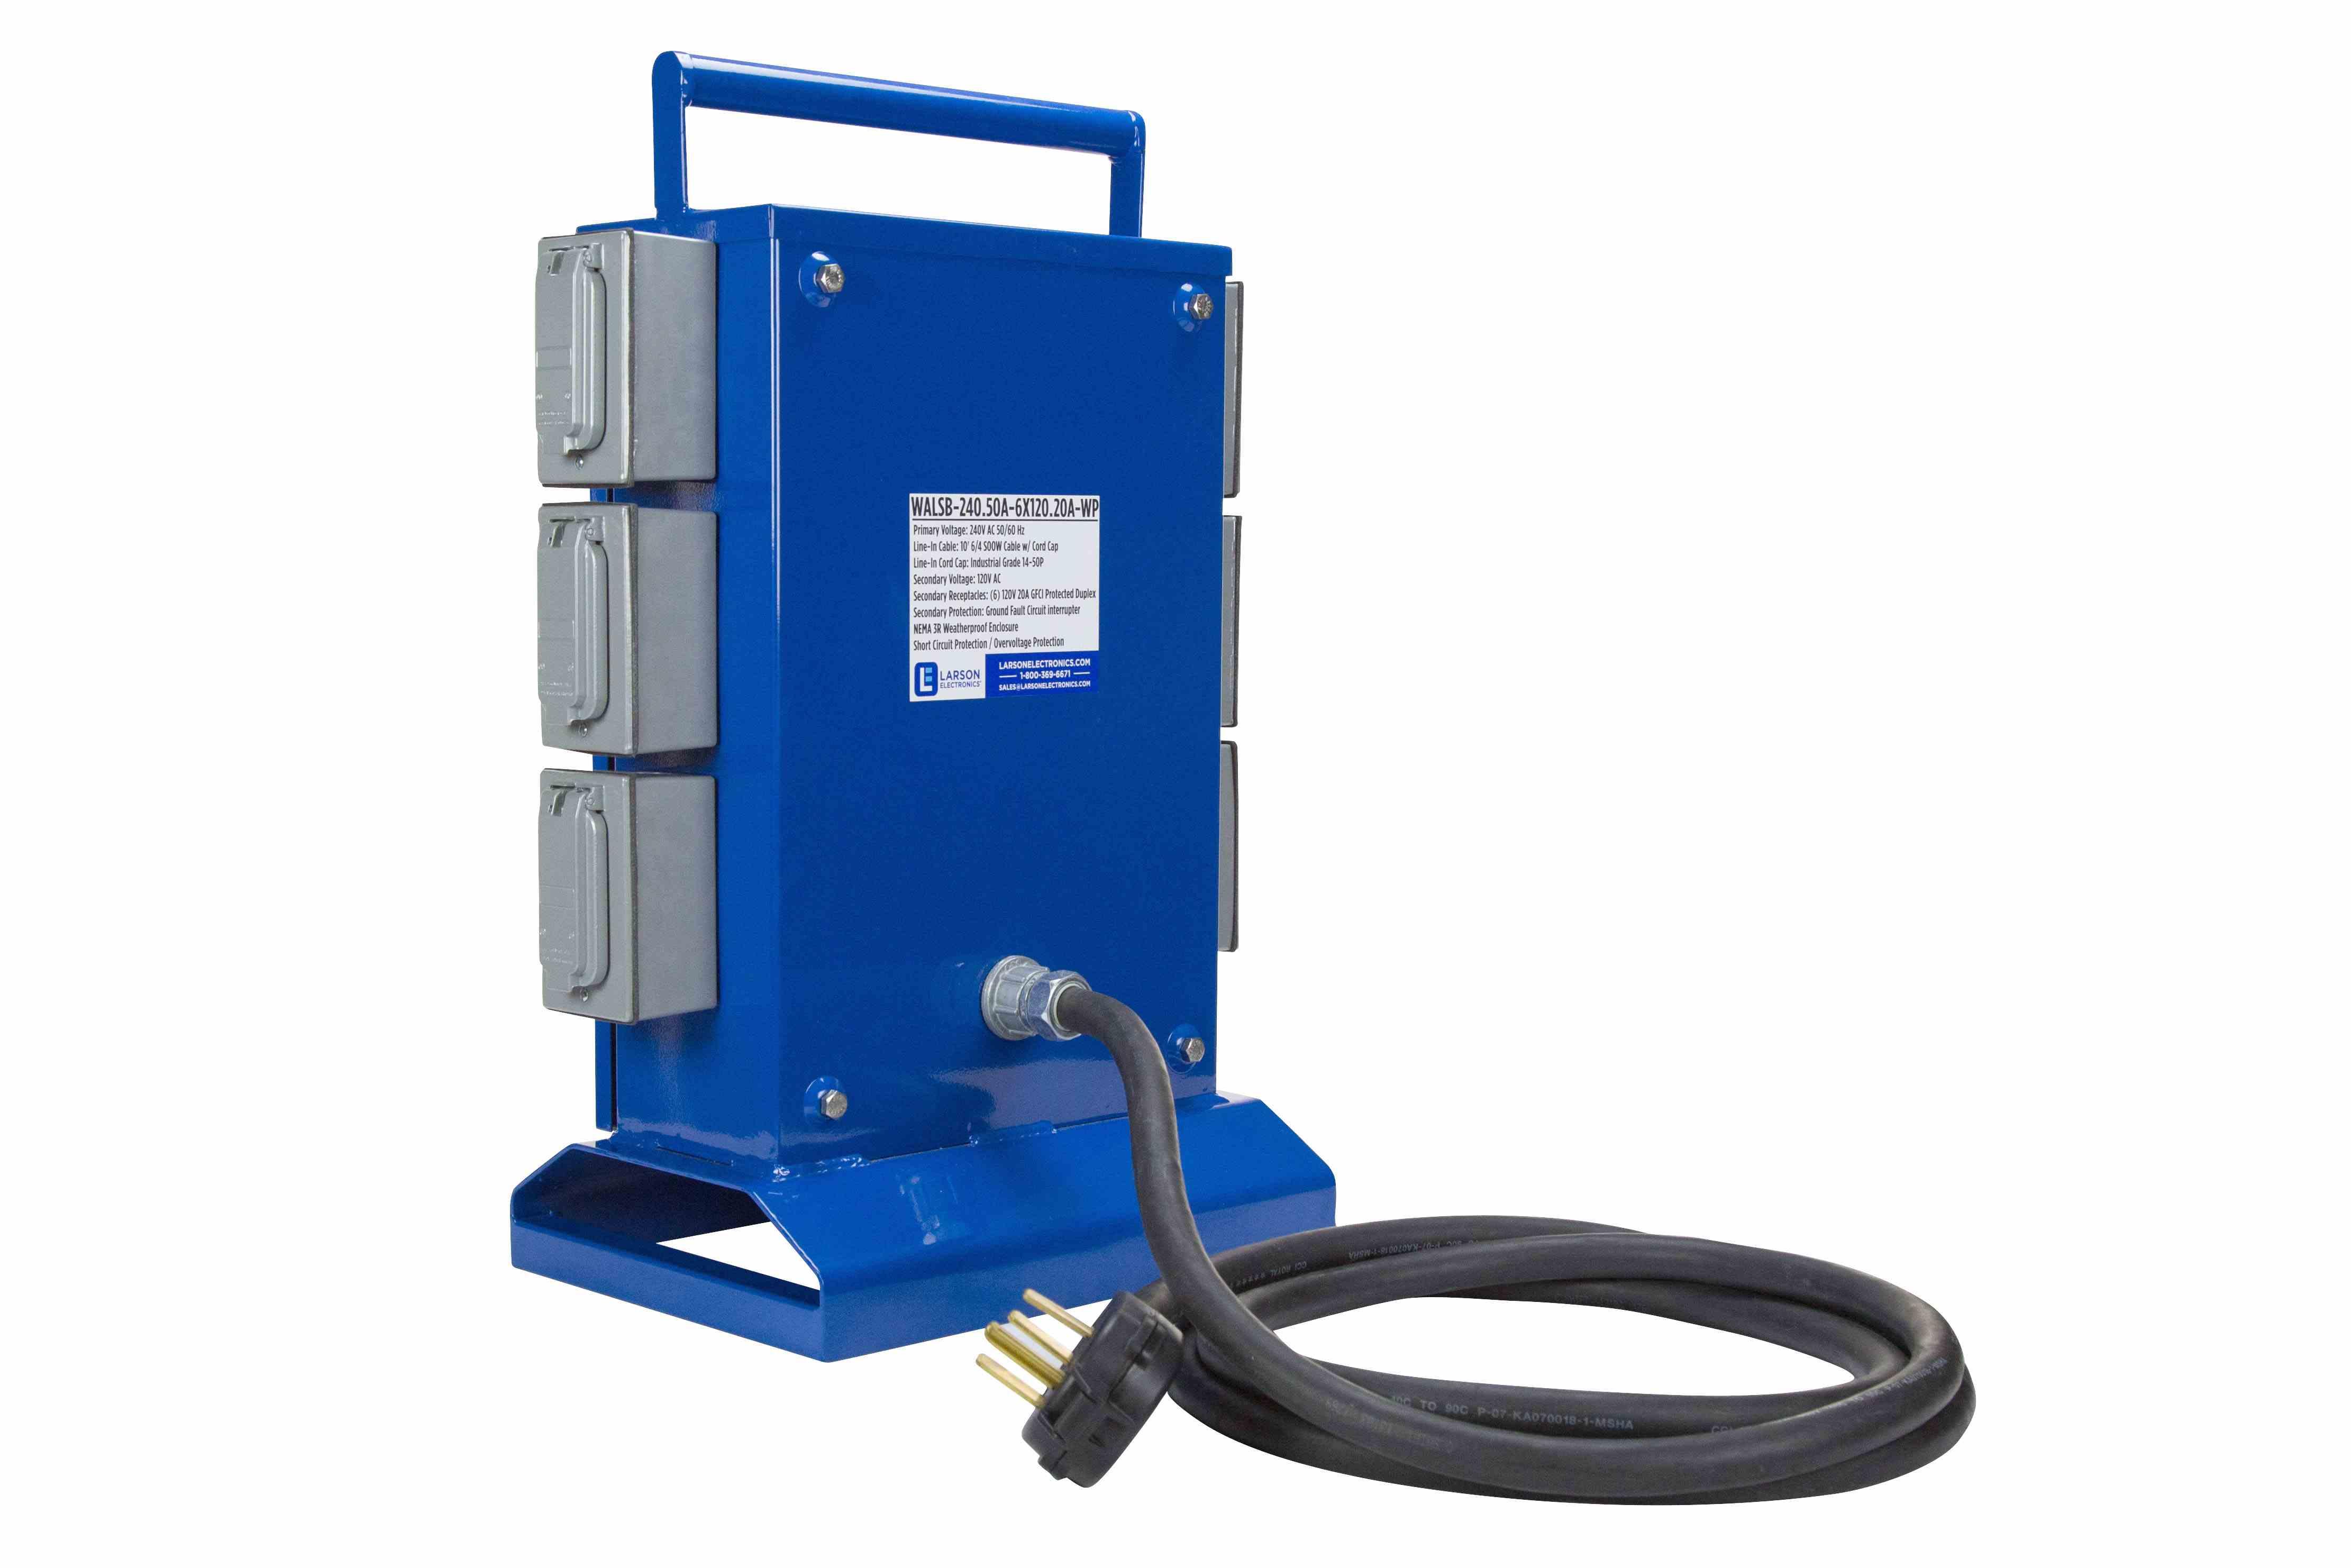 Spider Box 240 Volts Ac To 120 6 120v 20a Gfci Short Circuit Outlet Hi Res Image 9 Transformer